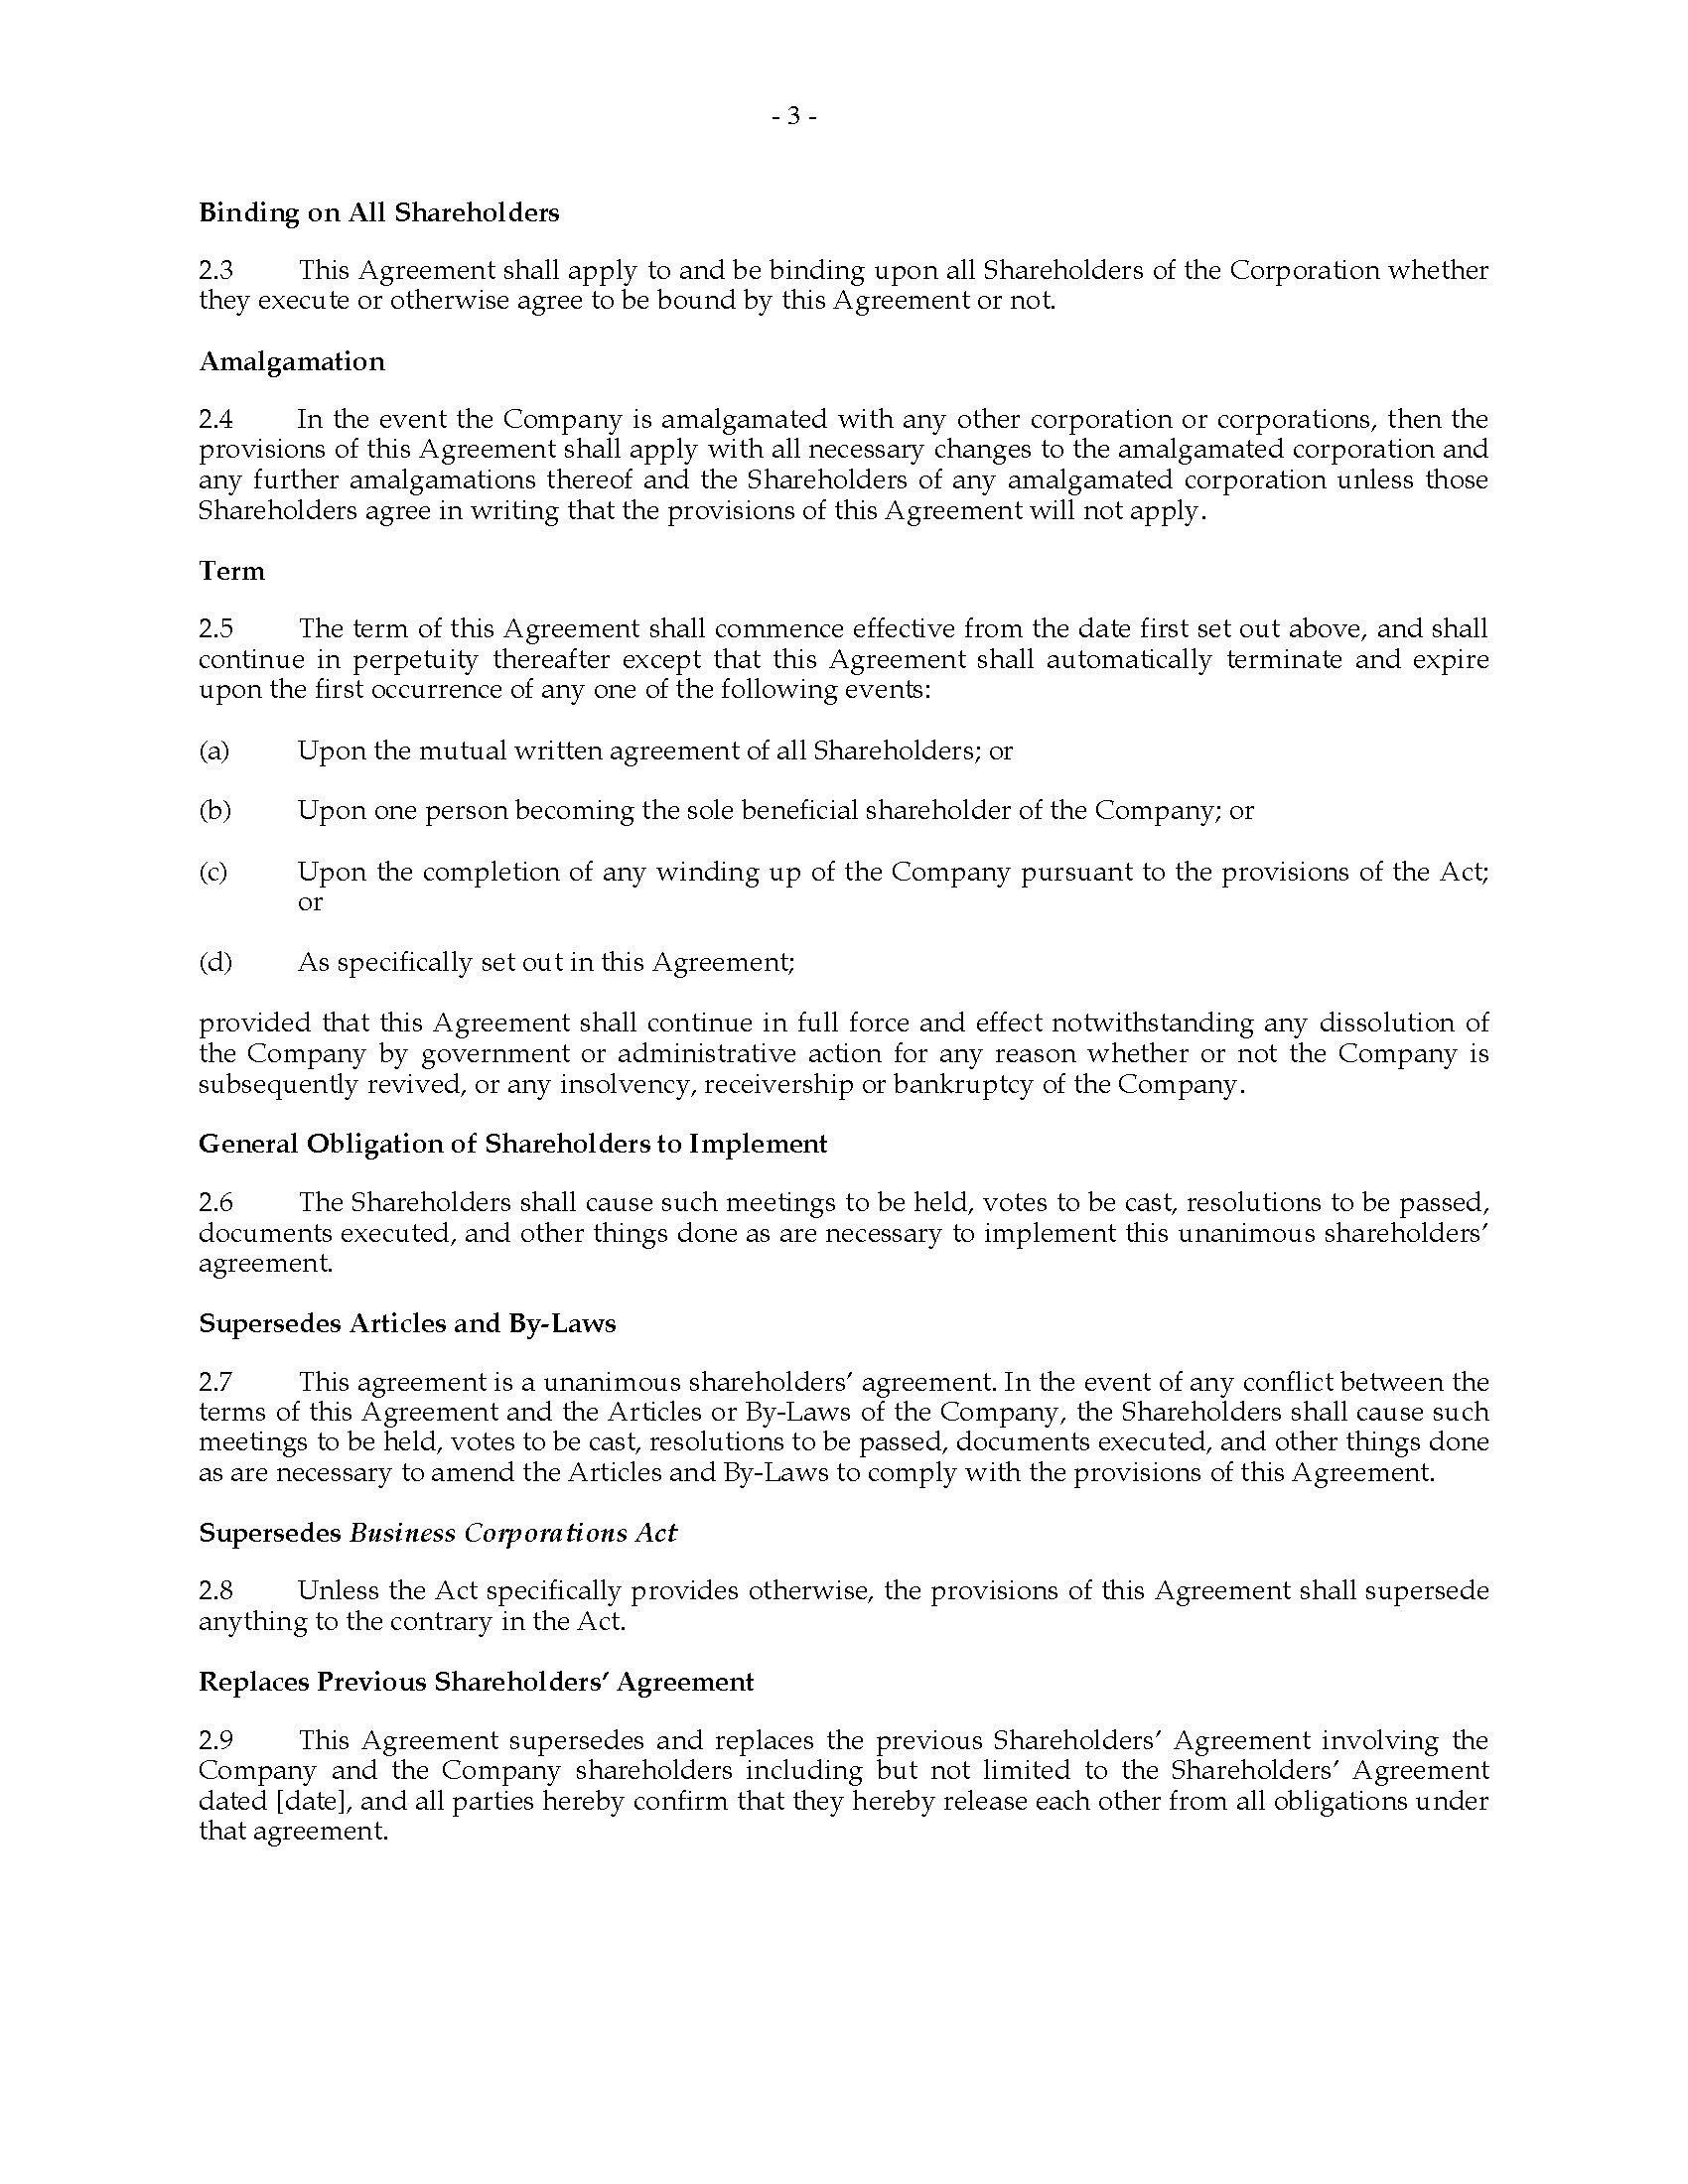 Ontario Unanimous Shareholders Agreement Between Shareholders And Regarding Termination Of Shareholders Agreement Template